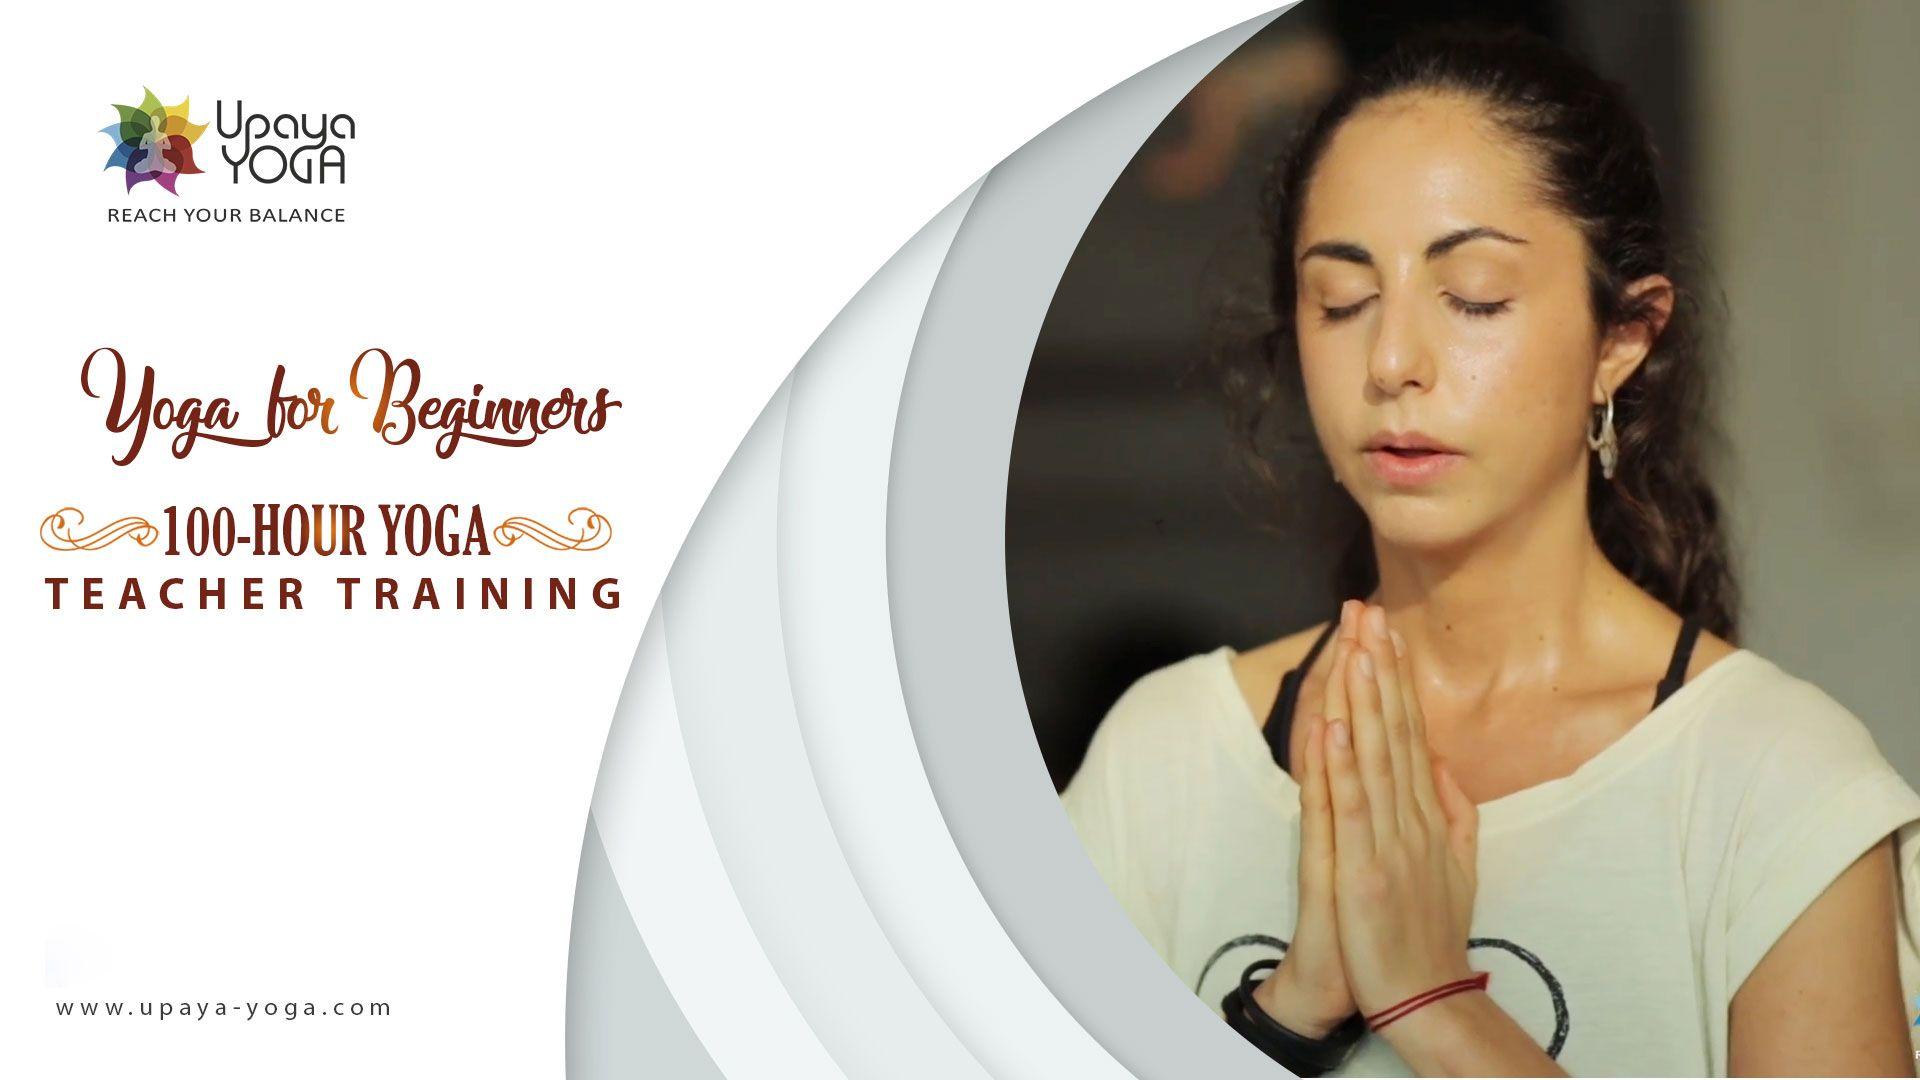 Yoga Teacher Training Course Goa In 2020 Yoga Teacher Training Course Yoga Teacher Training Yoga Teacher